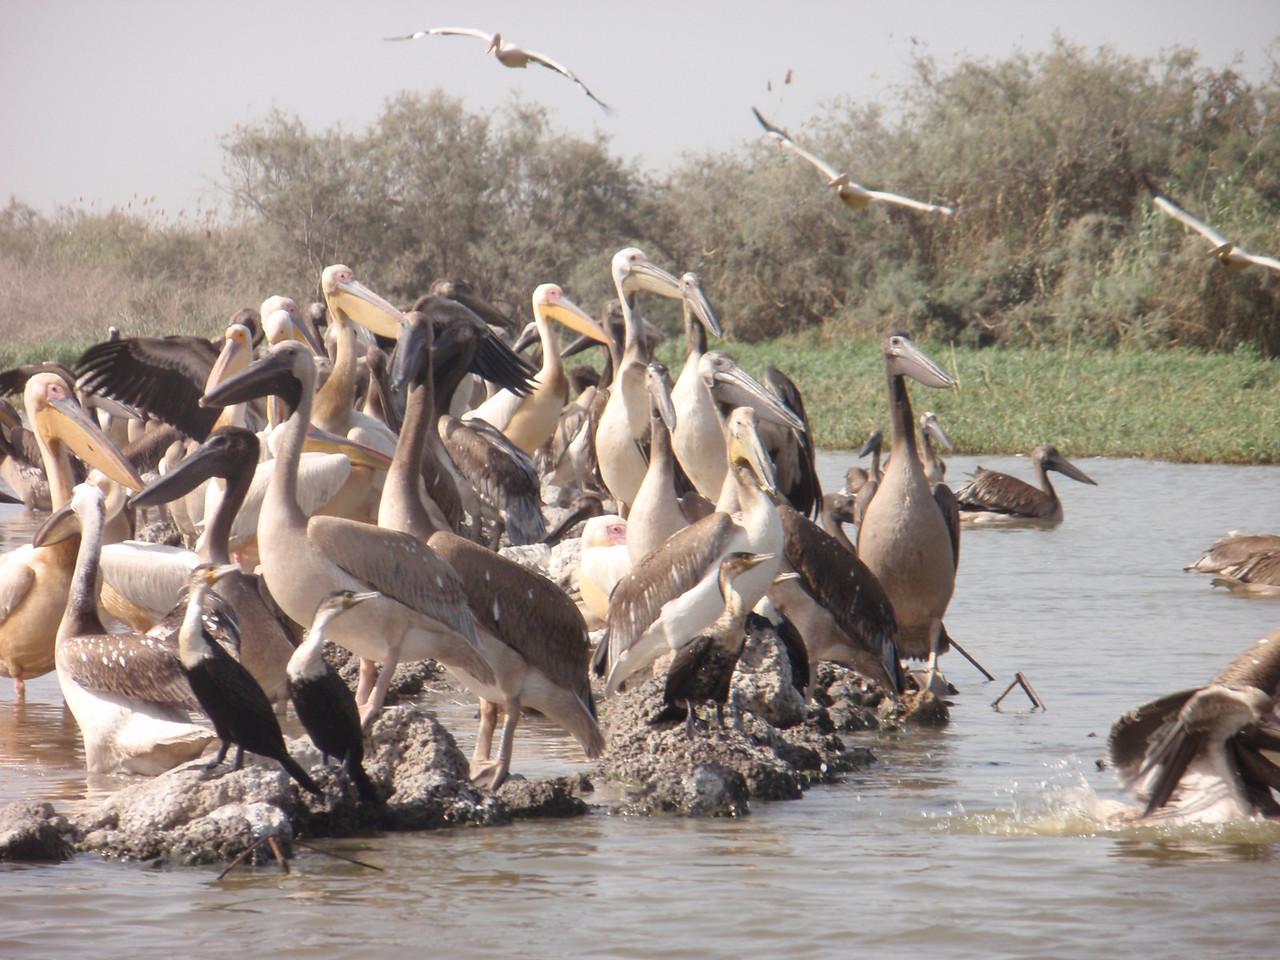 149_Djoudj National Bird Park  Colonies of Pelicans Taking Flight